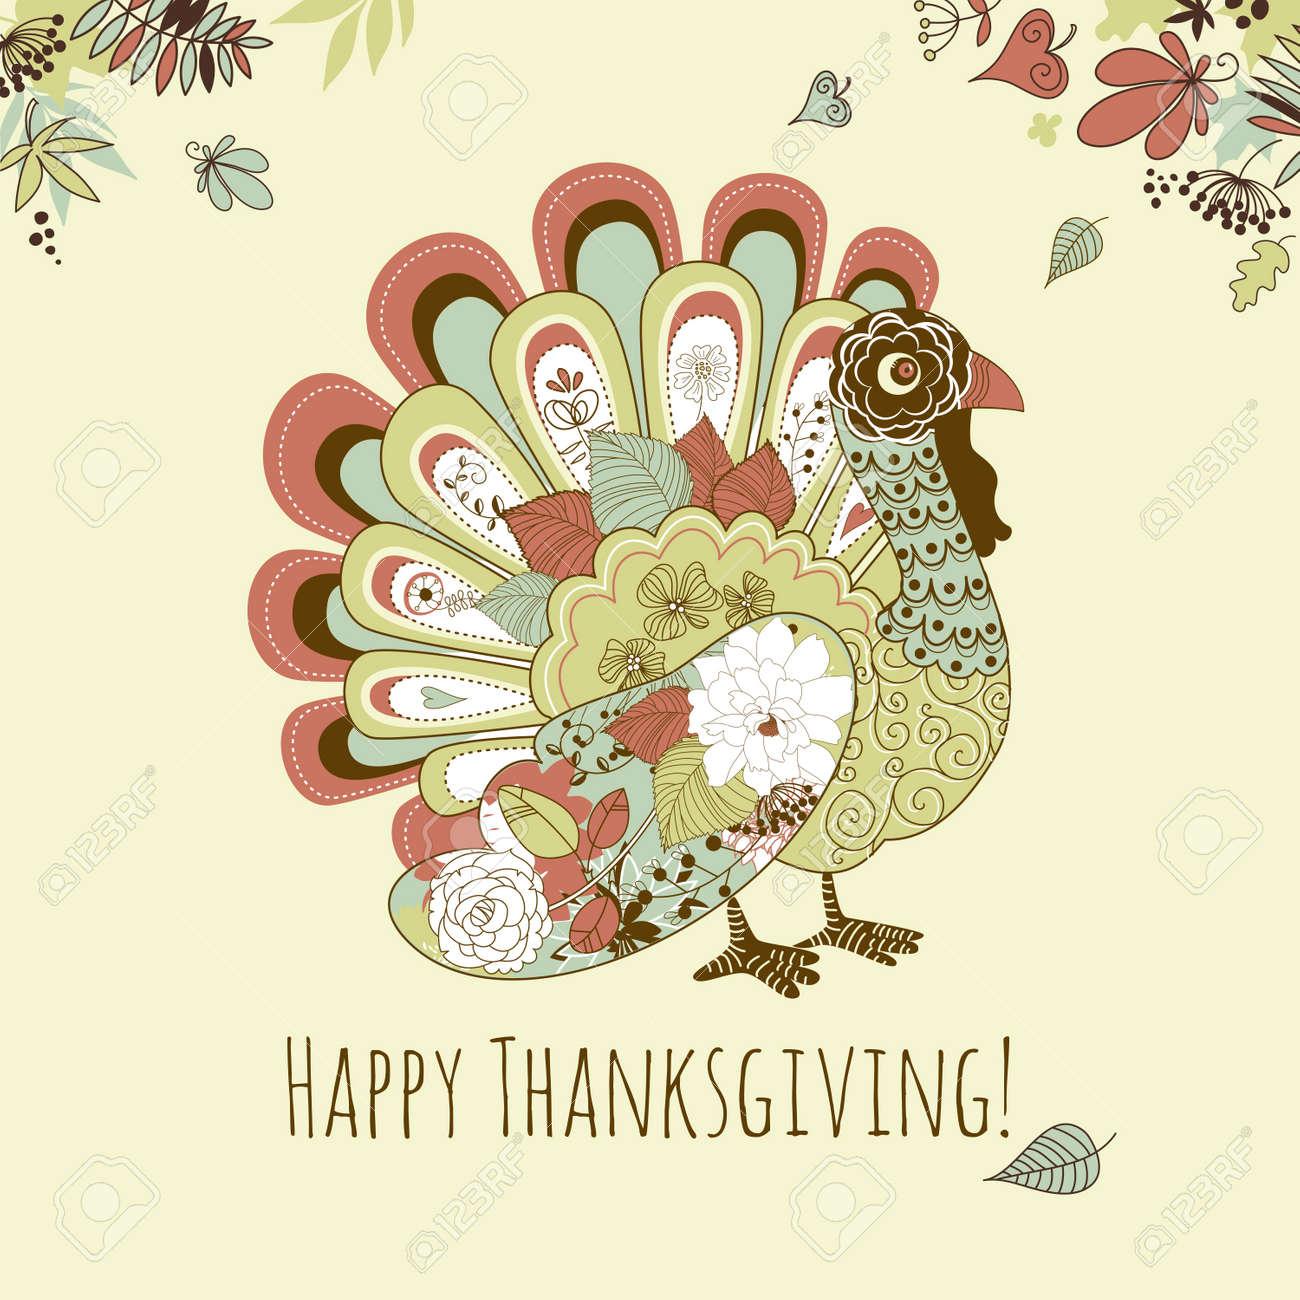 Happy Thanksgiving beautiful turkey card Stock Vector - 16681212